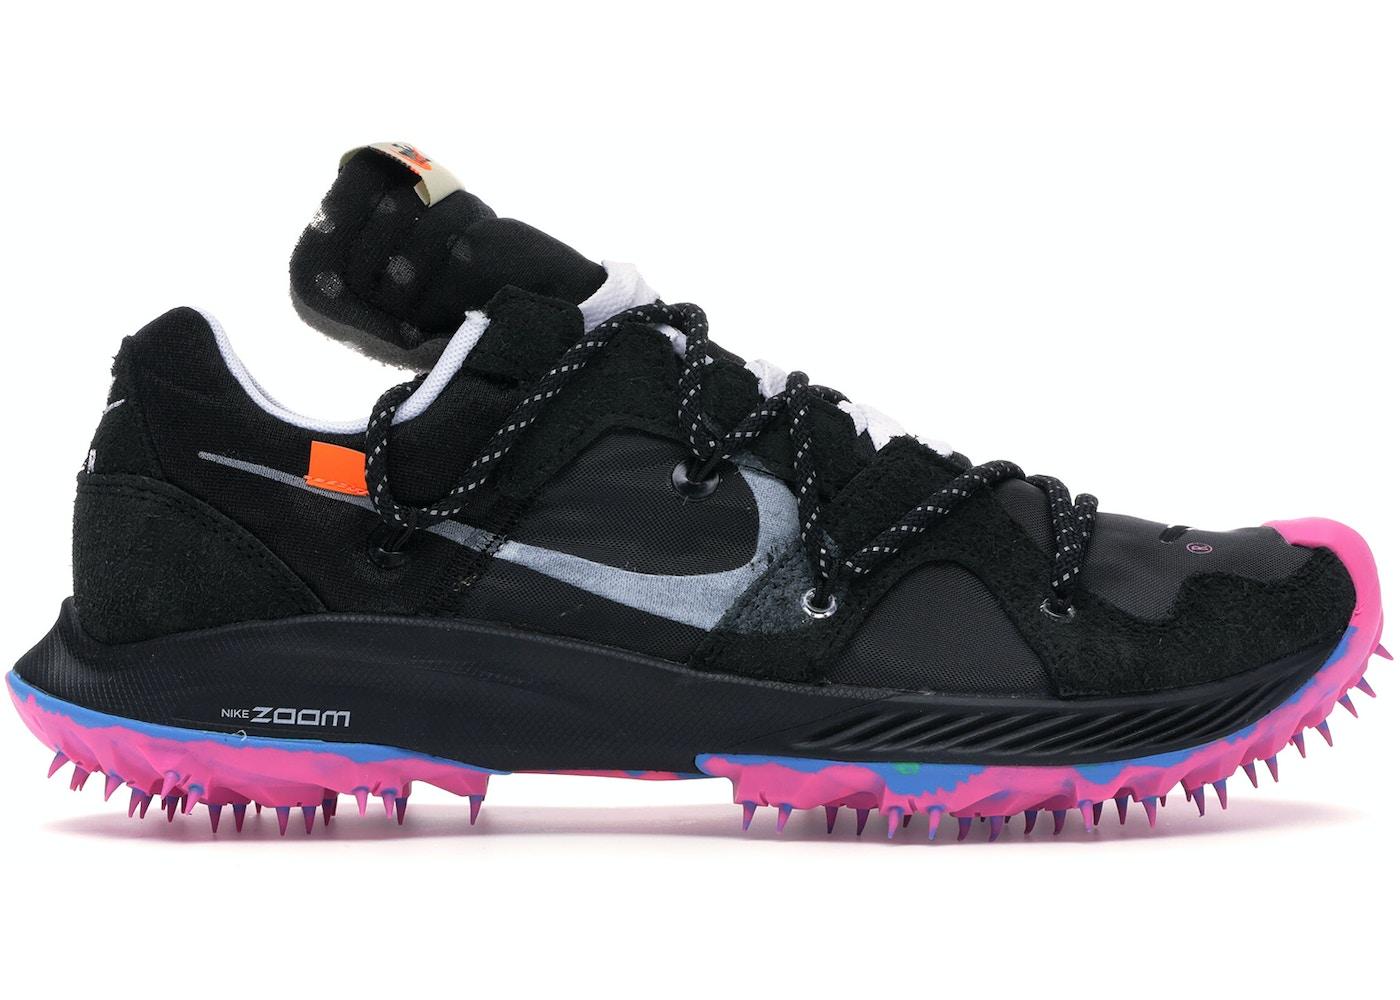 1f8fcb21 Buy & Sell Deadstock Shoes - Real Yeezys, Retro Jordans, Nike